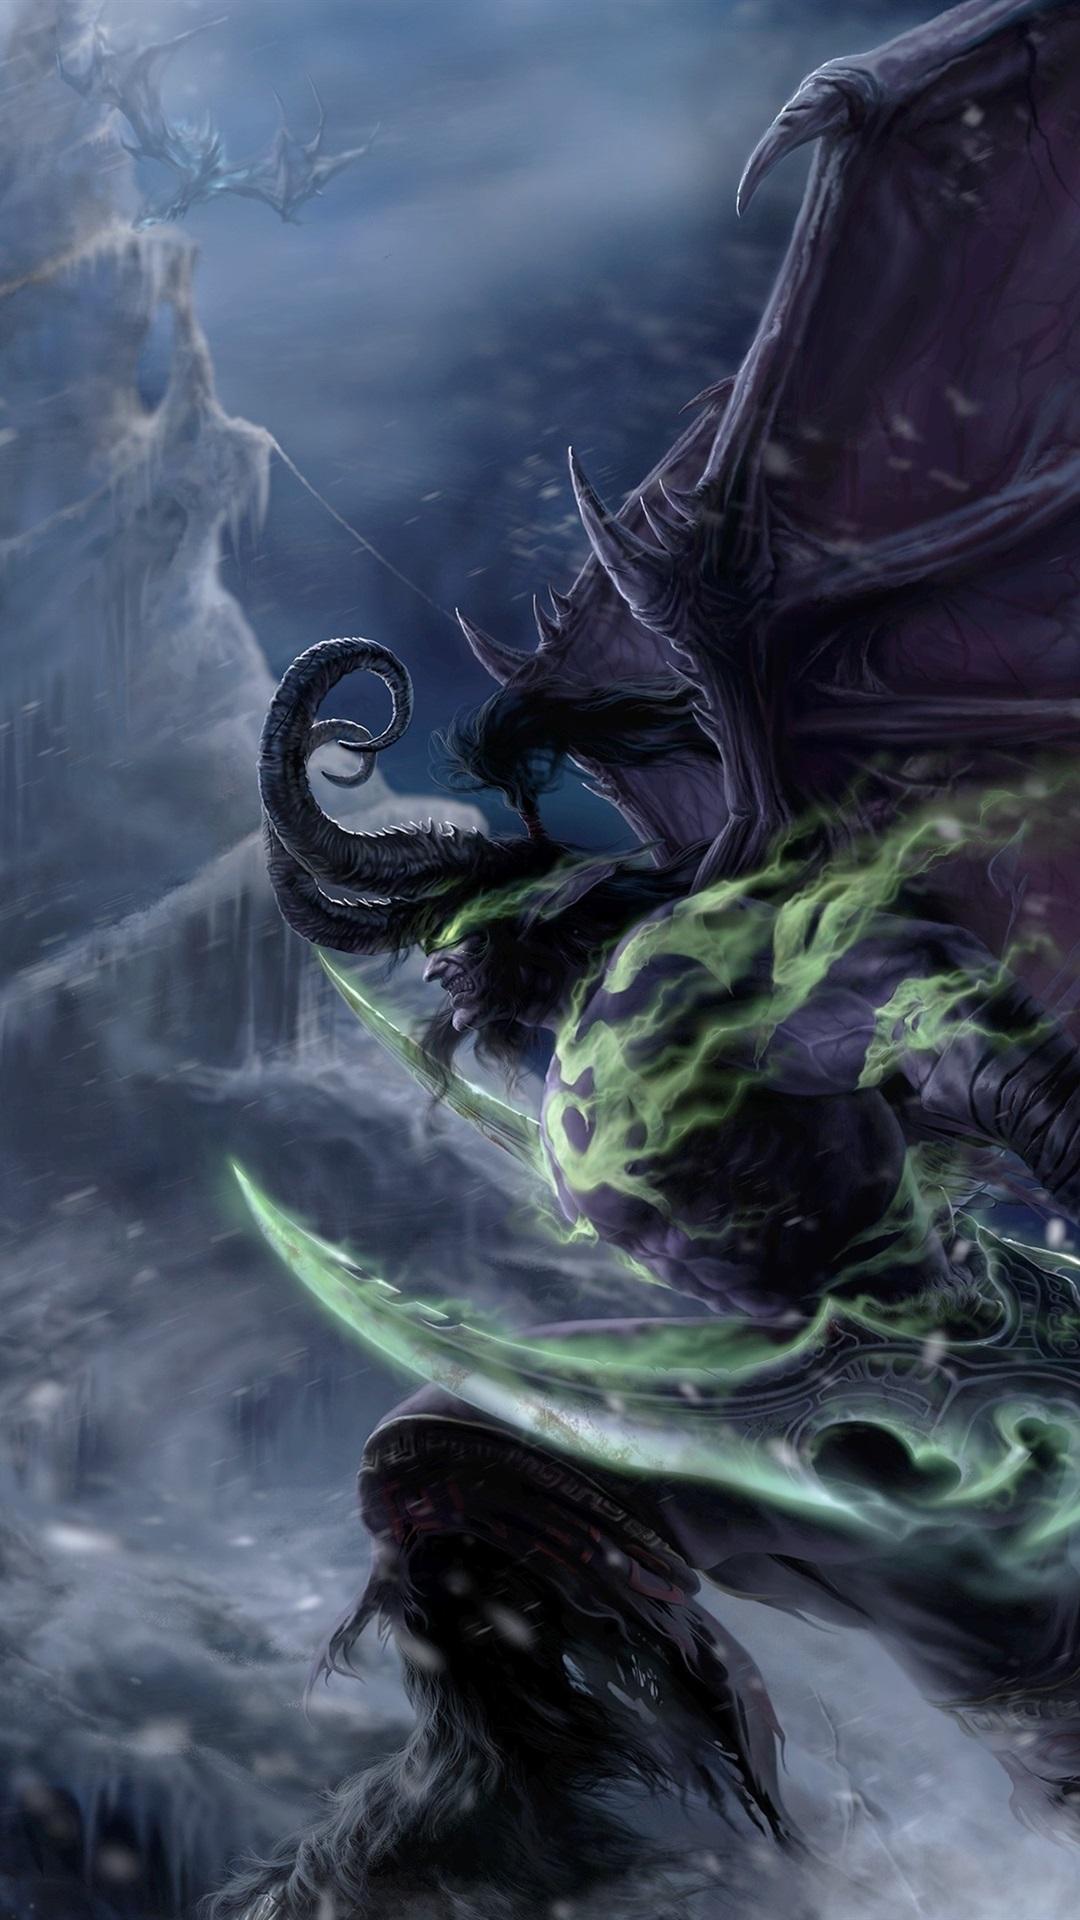 Wallpaper illidan stormrage warcraft demon elf art - Demon wallpaper 4k ...